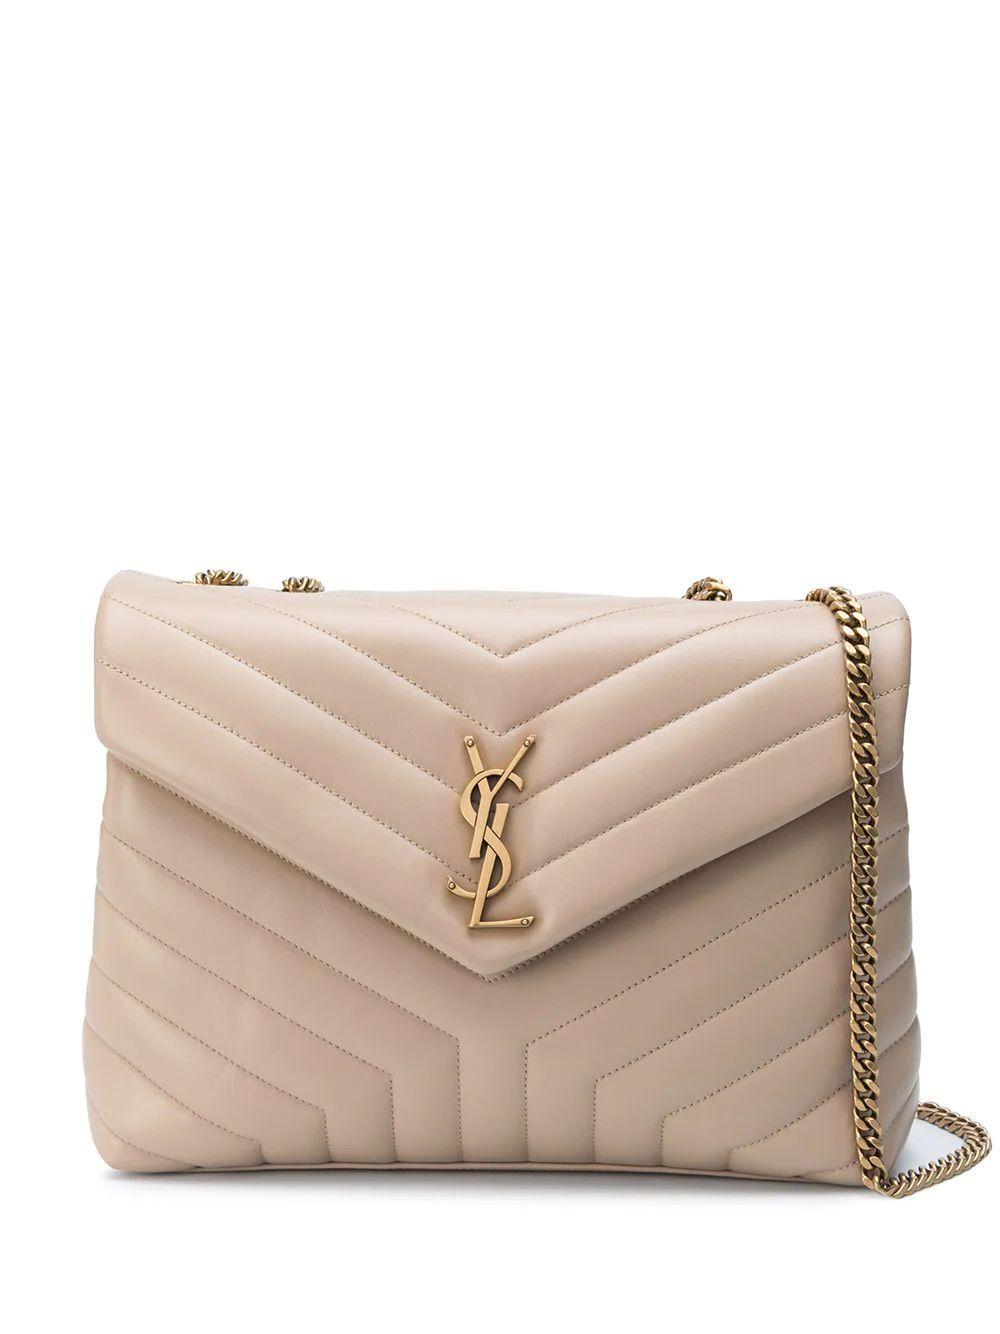 Lou Lou Shoulder Bag Item # 574946DV727-F21